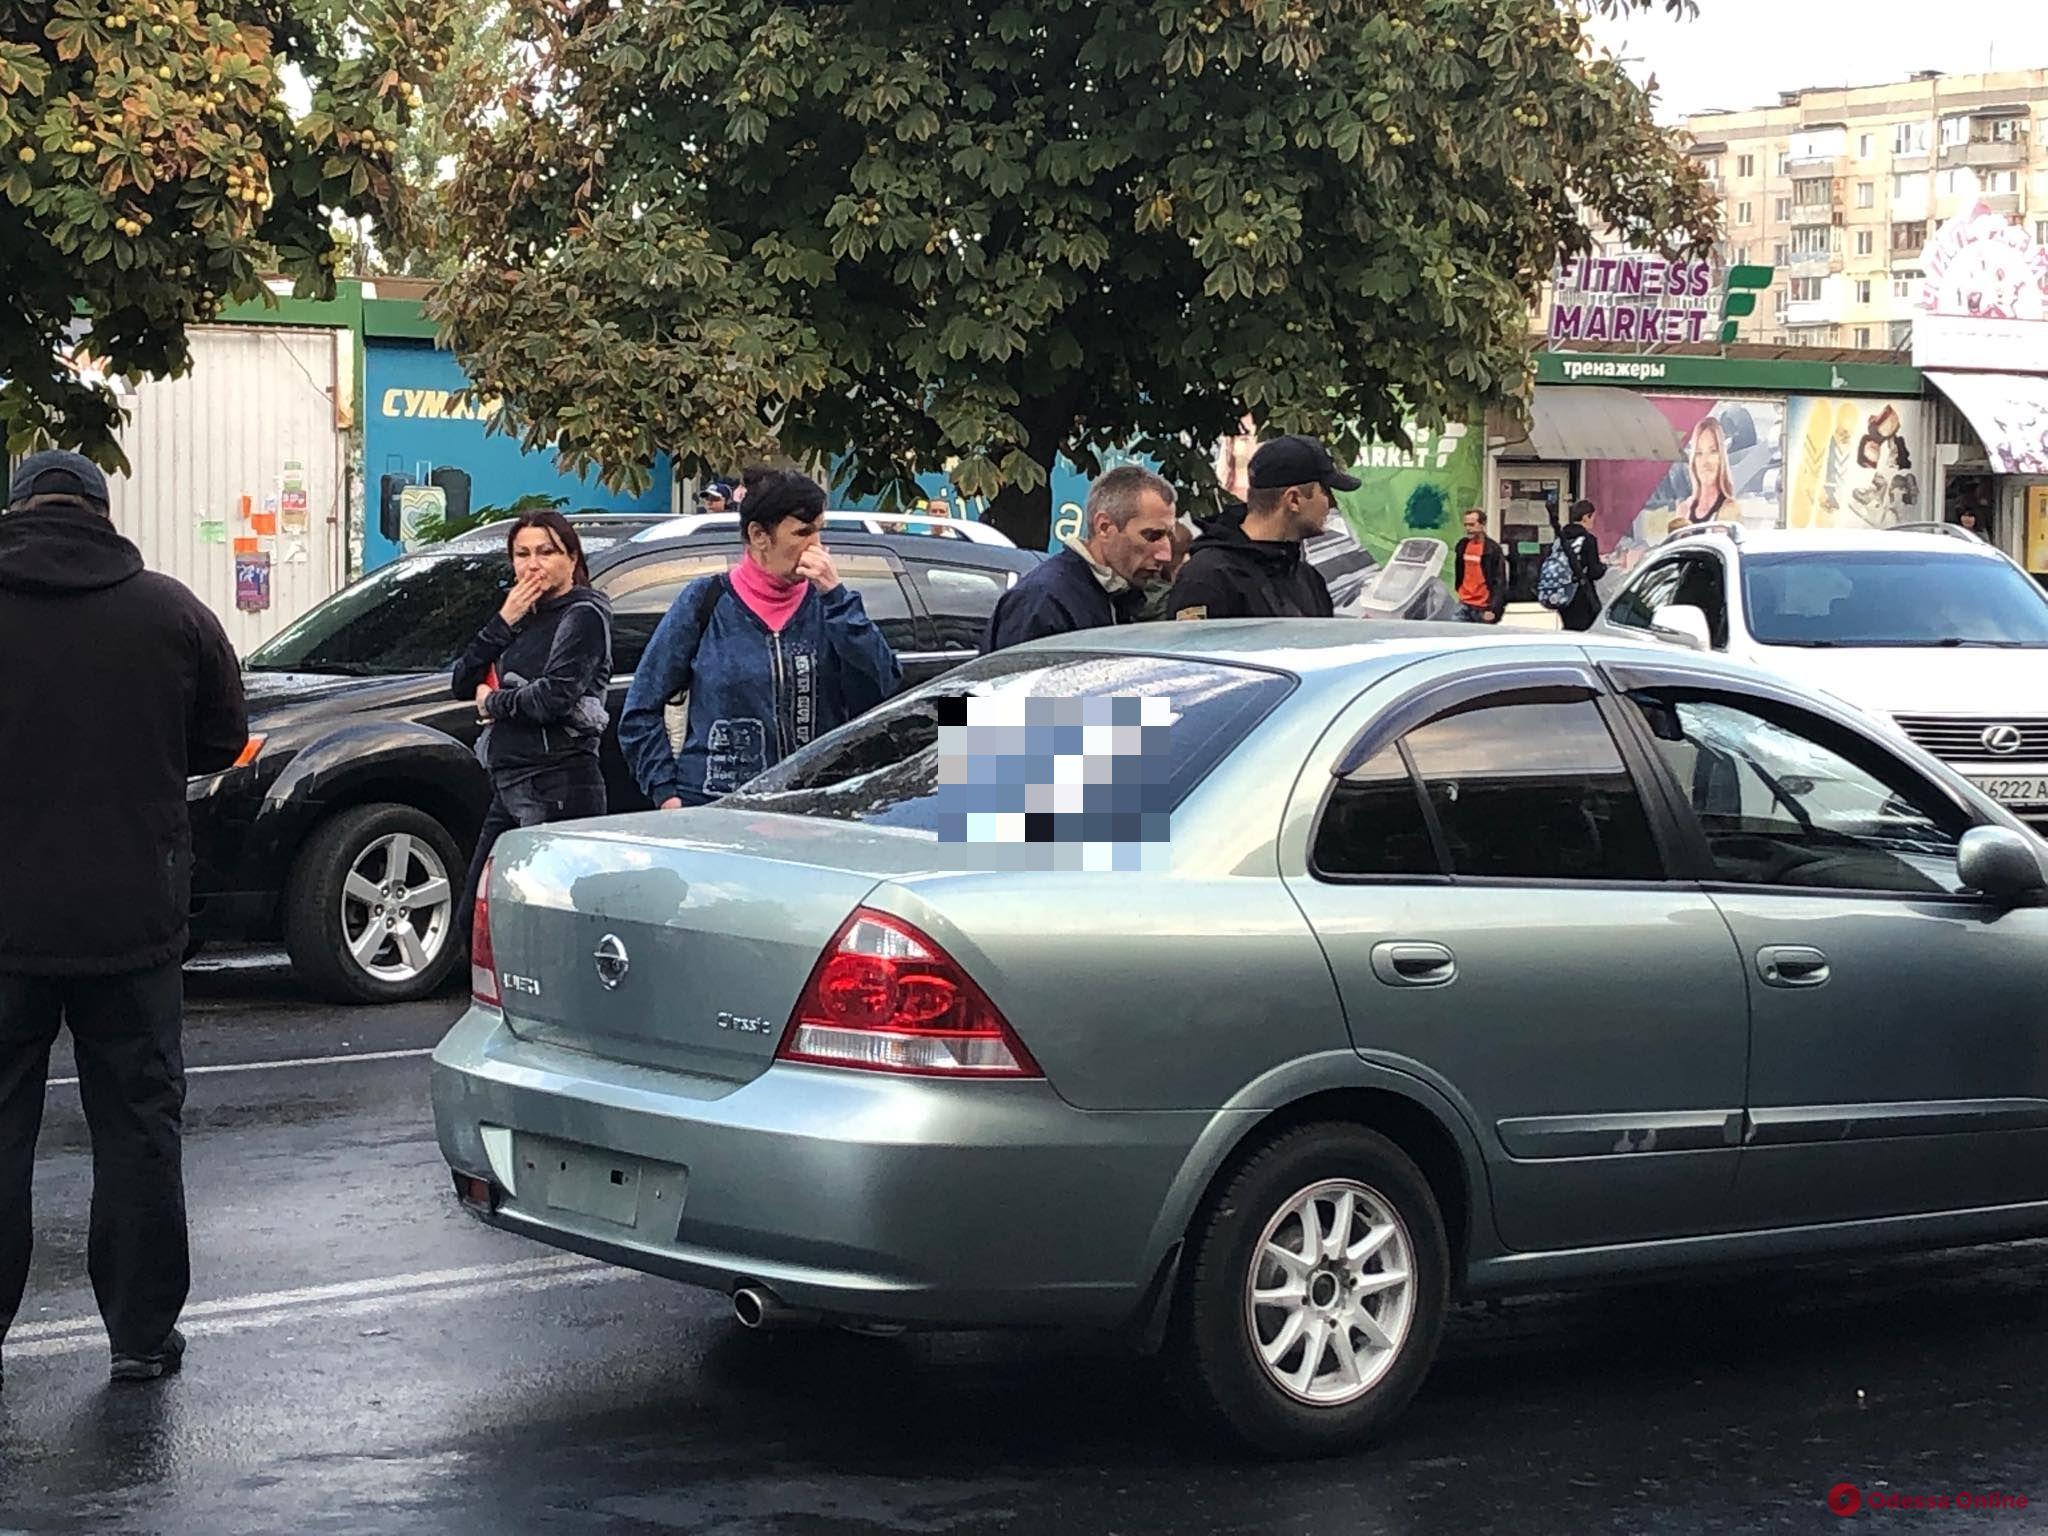 Протянула на капоте: на Таирова автоледи таранила перекрывших дорогу протестующих